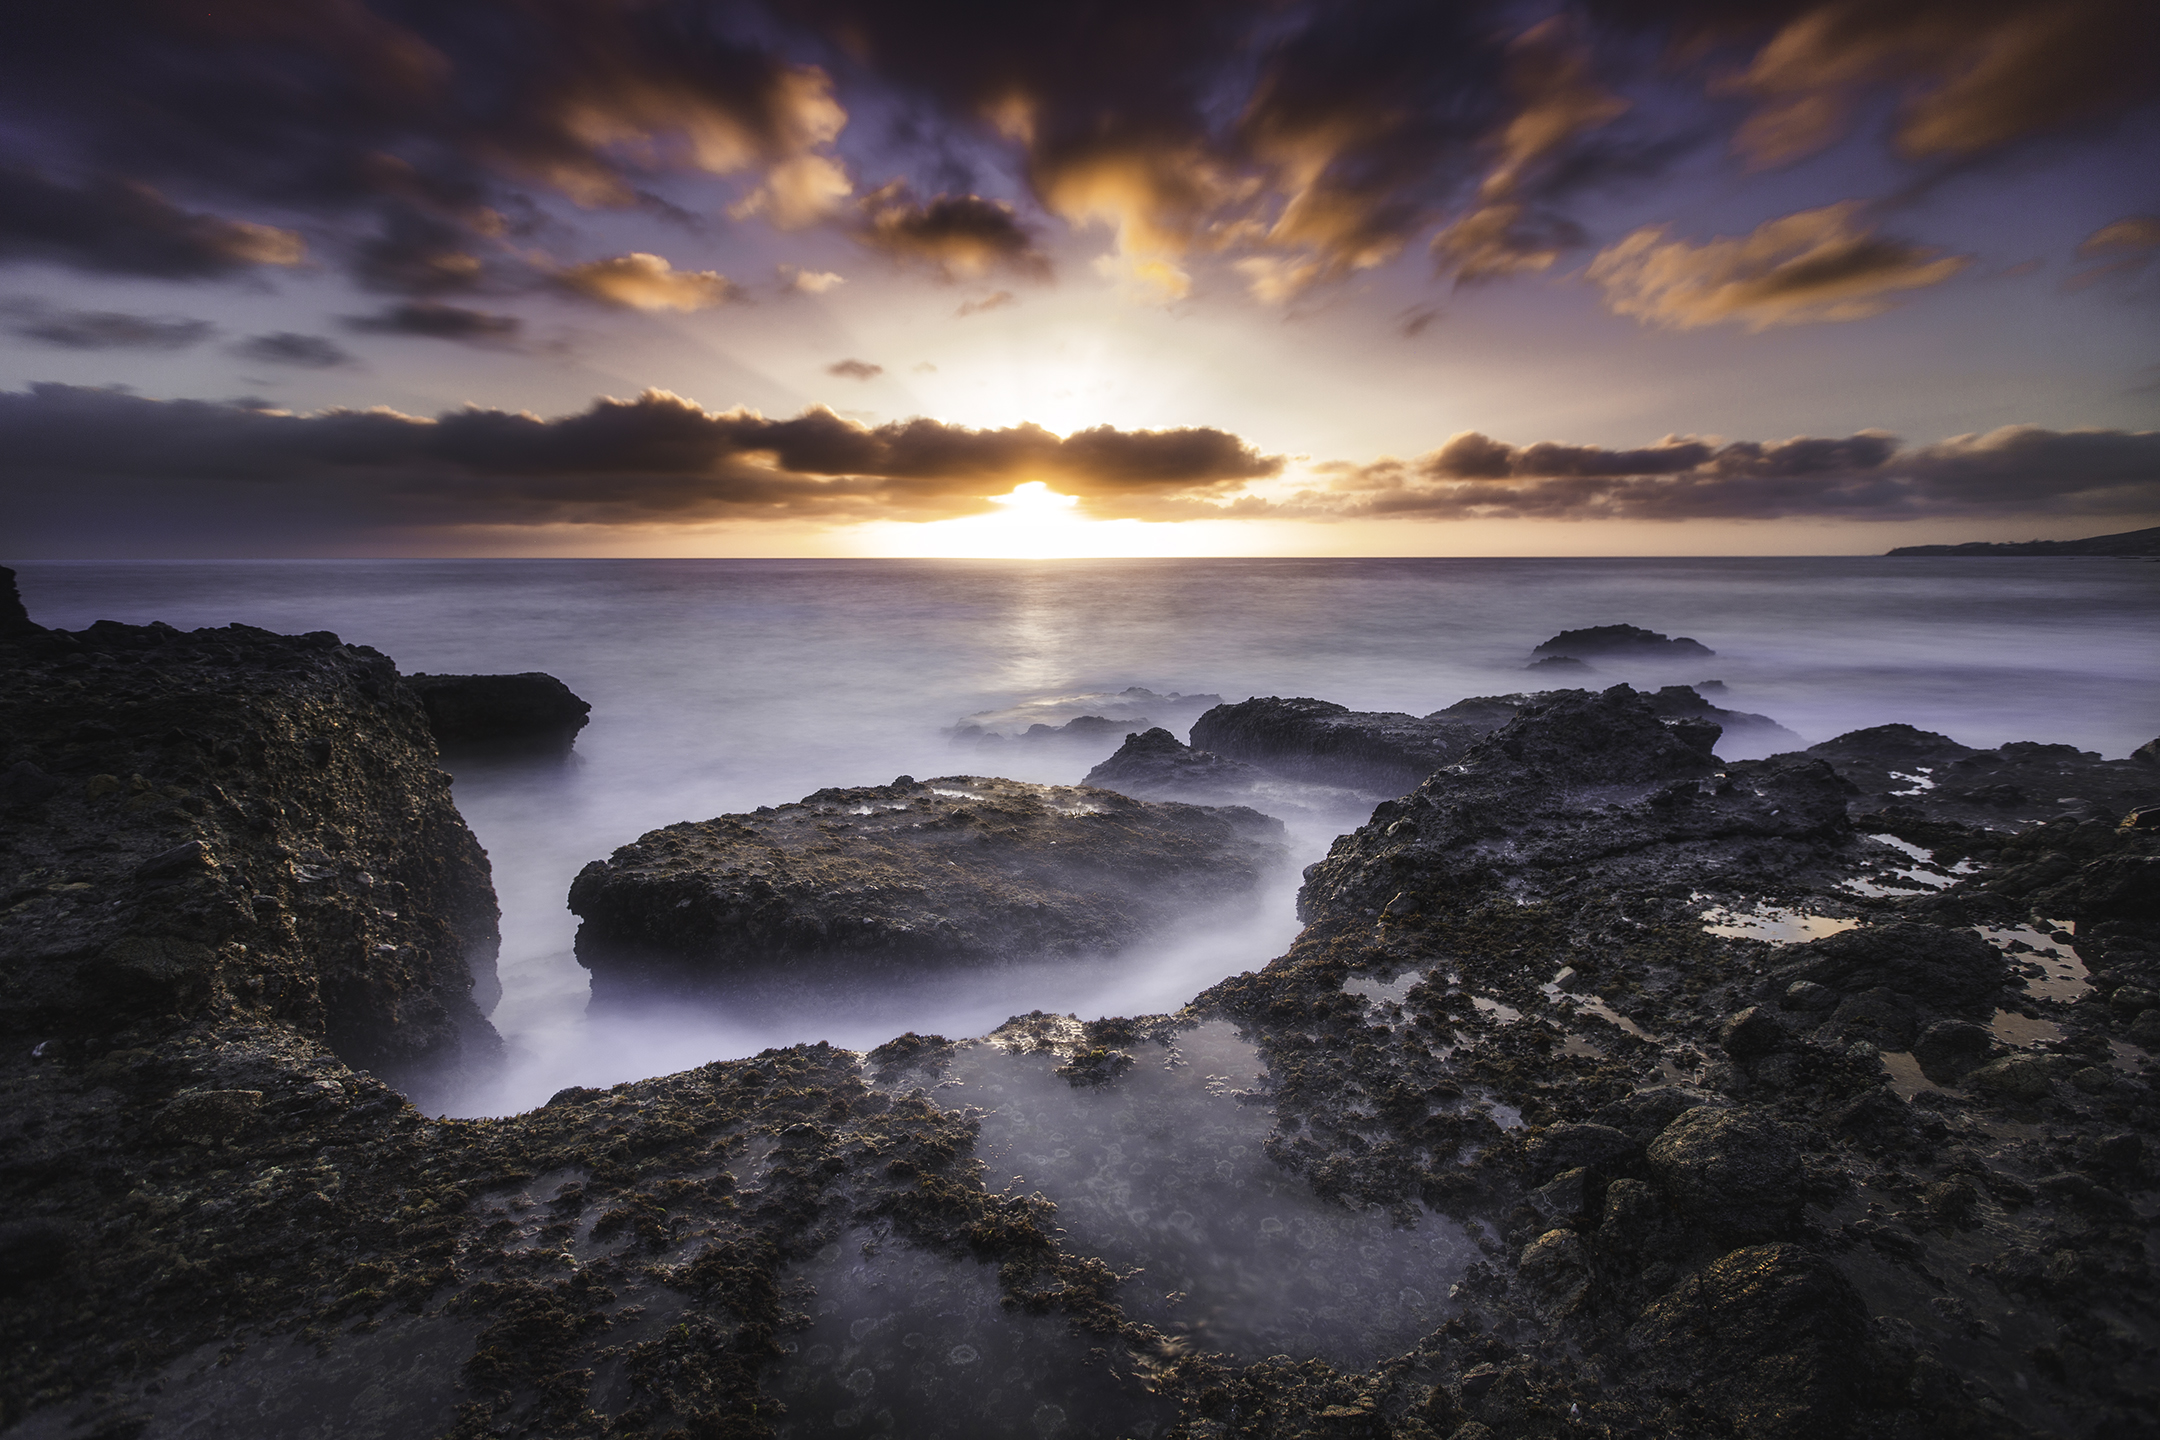 California Coast - Laguna Beach, California // Photographer: Jason Wilson // Canon 5D Mark III + Canon 16-35mm f/2.8L II // ISO 160, f/4, 30